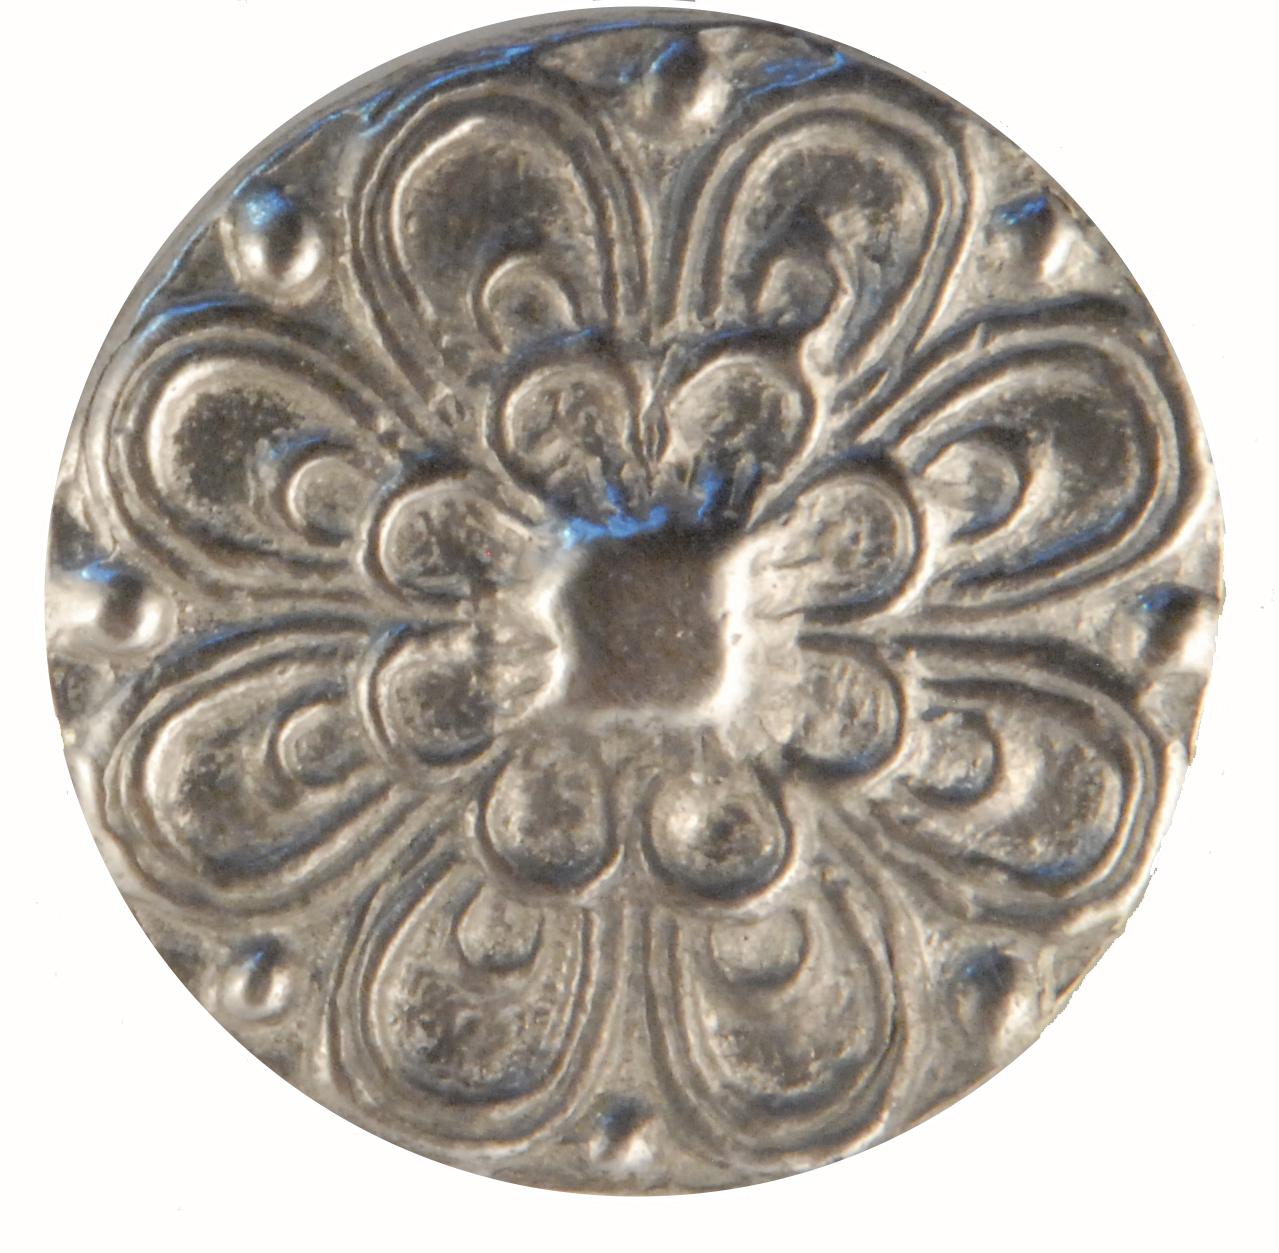 Petals Button